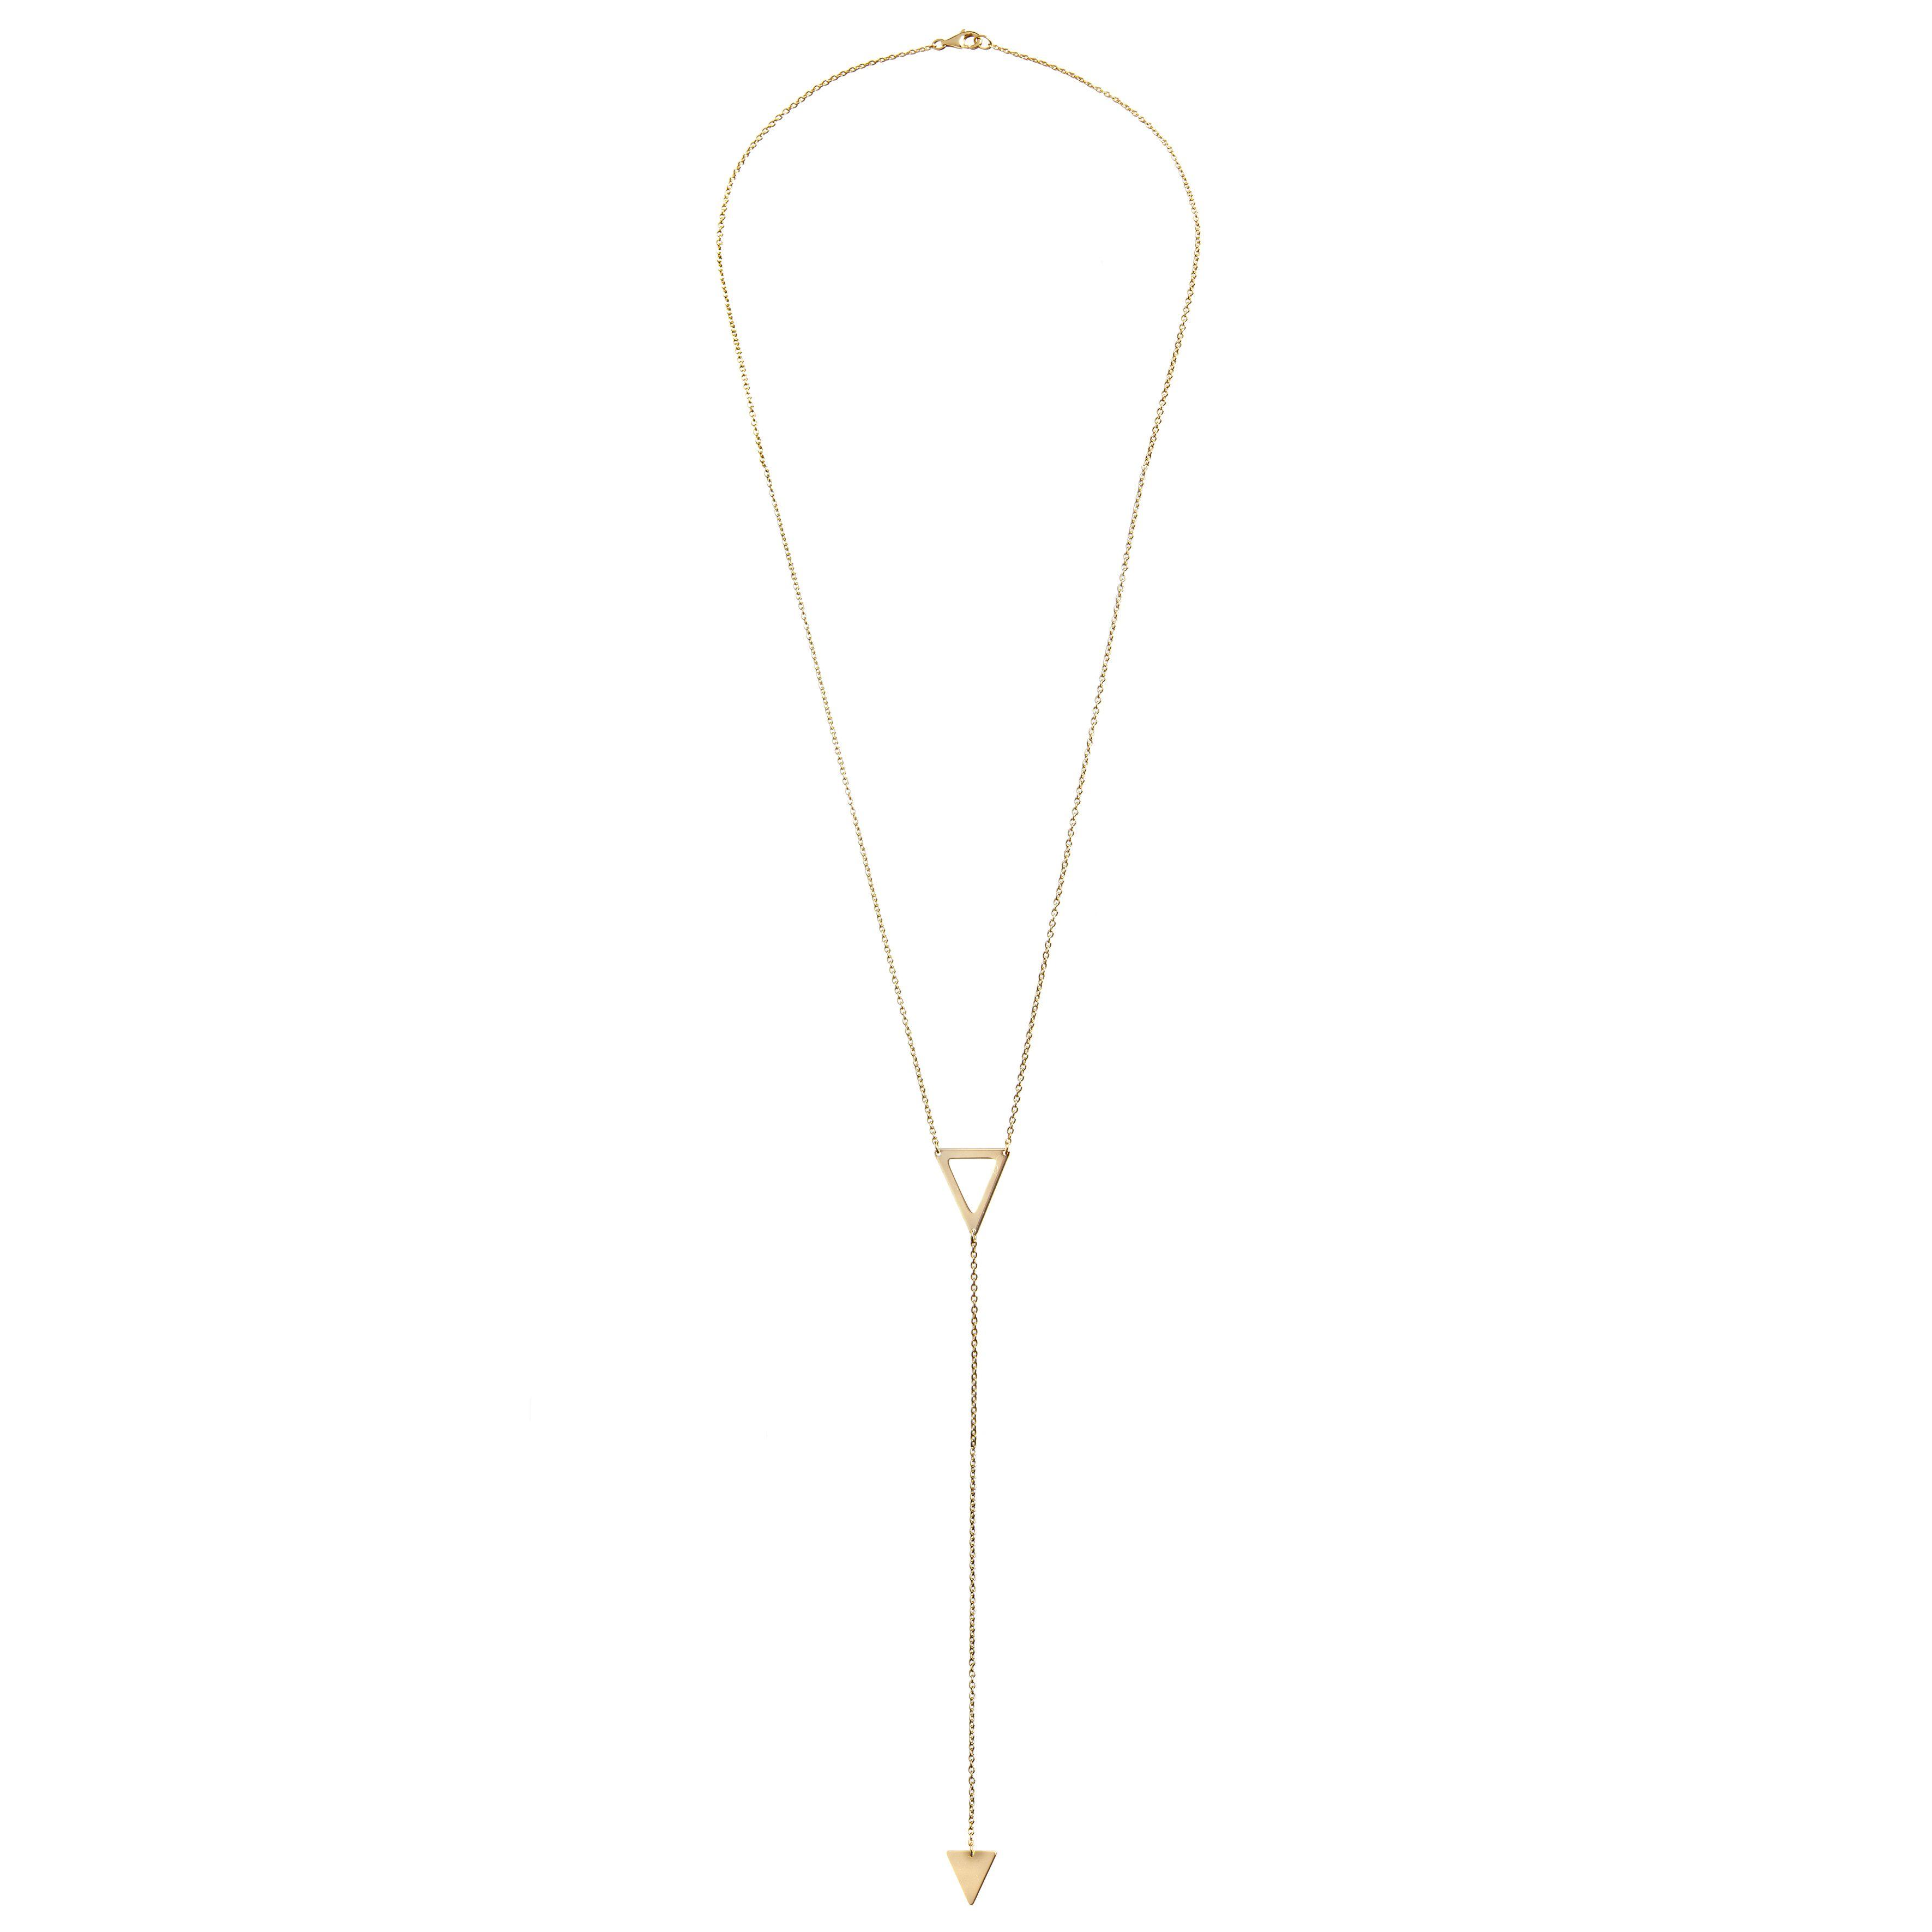 Gigi necklace by Les Soeurs, 925 silver gold plated, 60cm